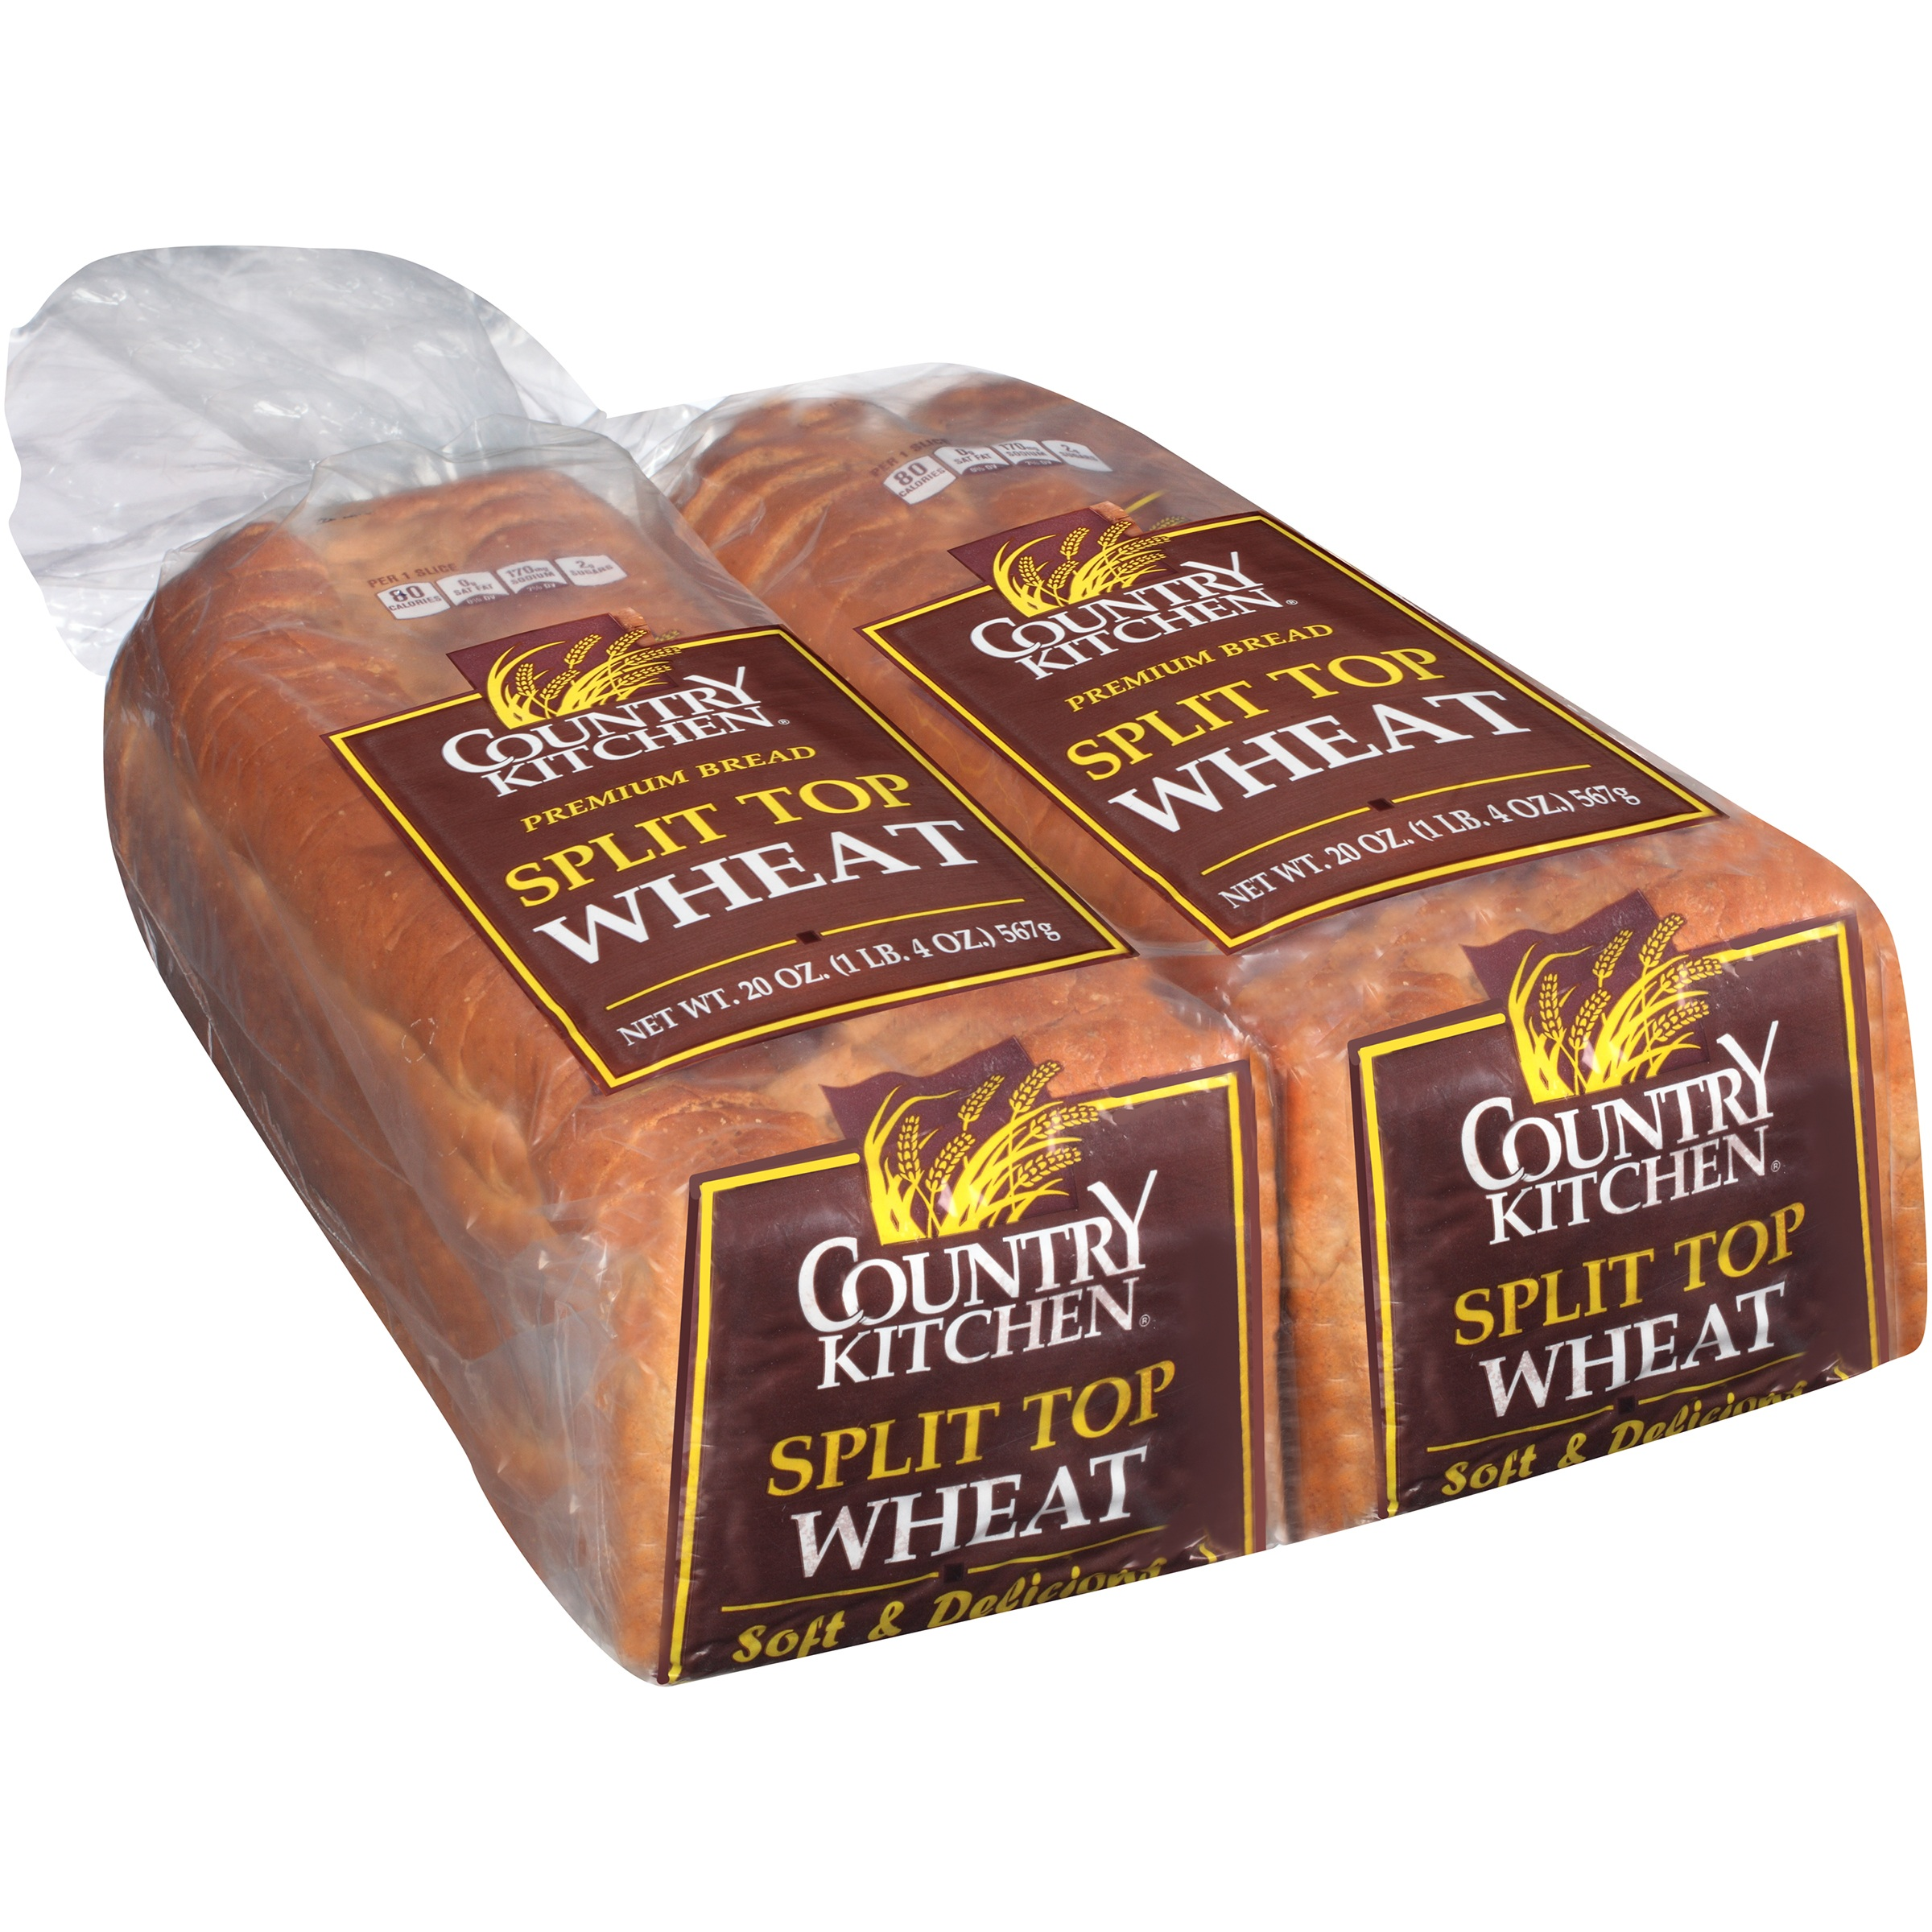 Country Kitchen Split Top Wheat Bread 2 20 Oz Loaf Bag Com